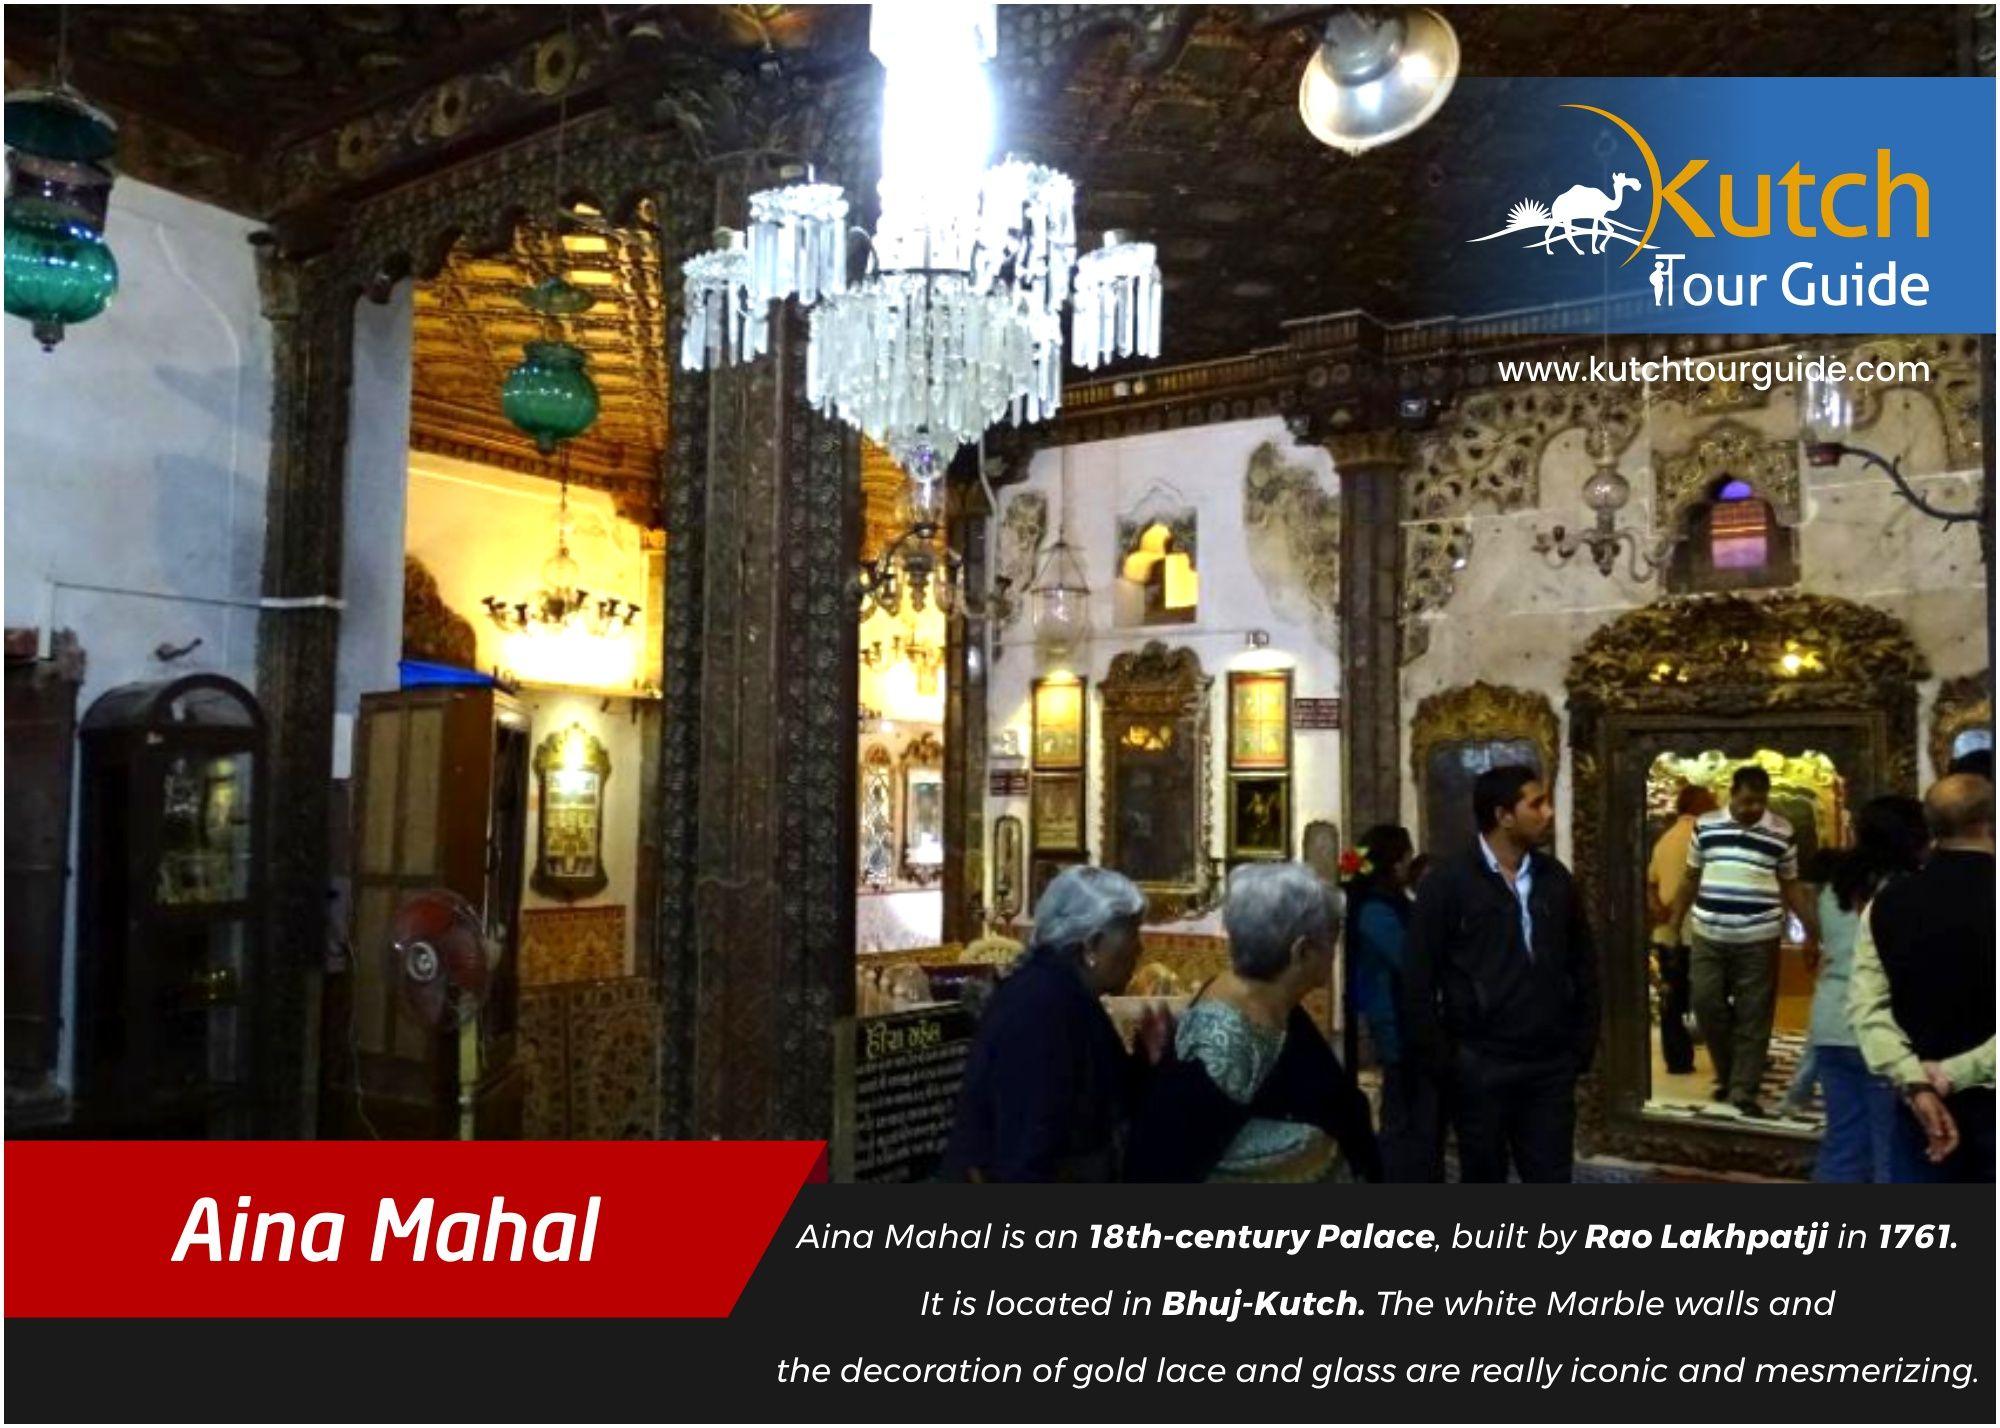 Aina Mahal The Mirrored Palace of Bhuj Palace, Bhuj